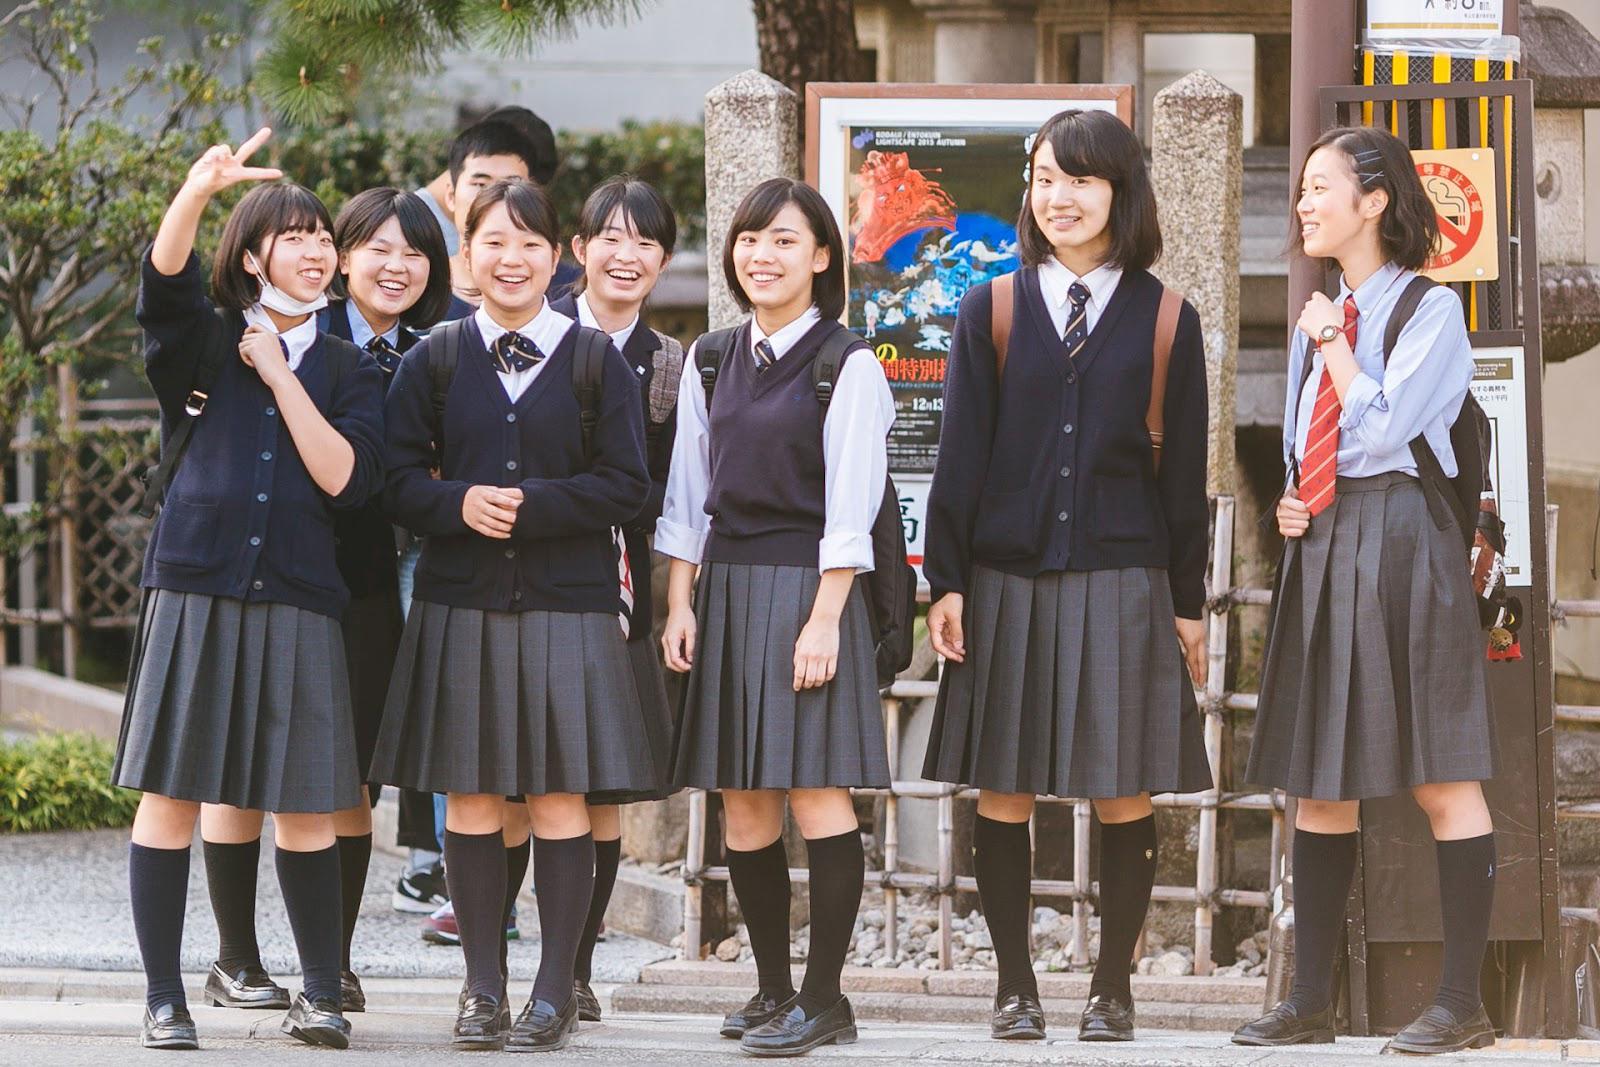 Penampakan Rok Mini siswi Jepang di Jalan